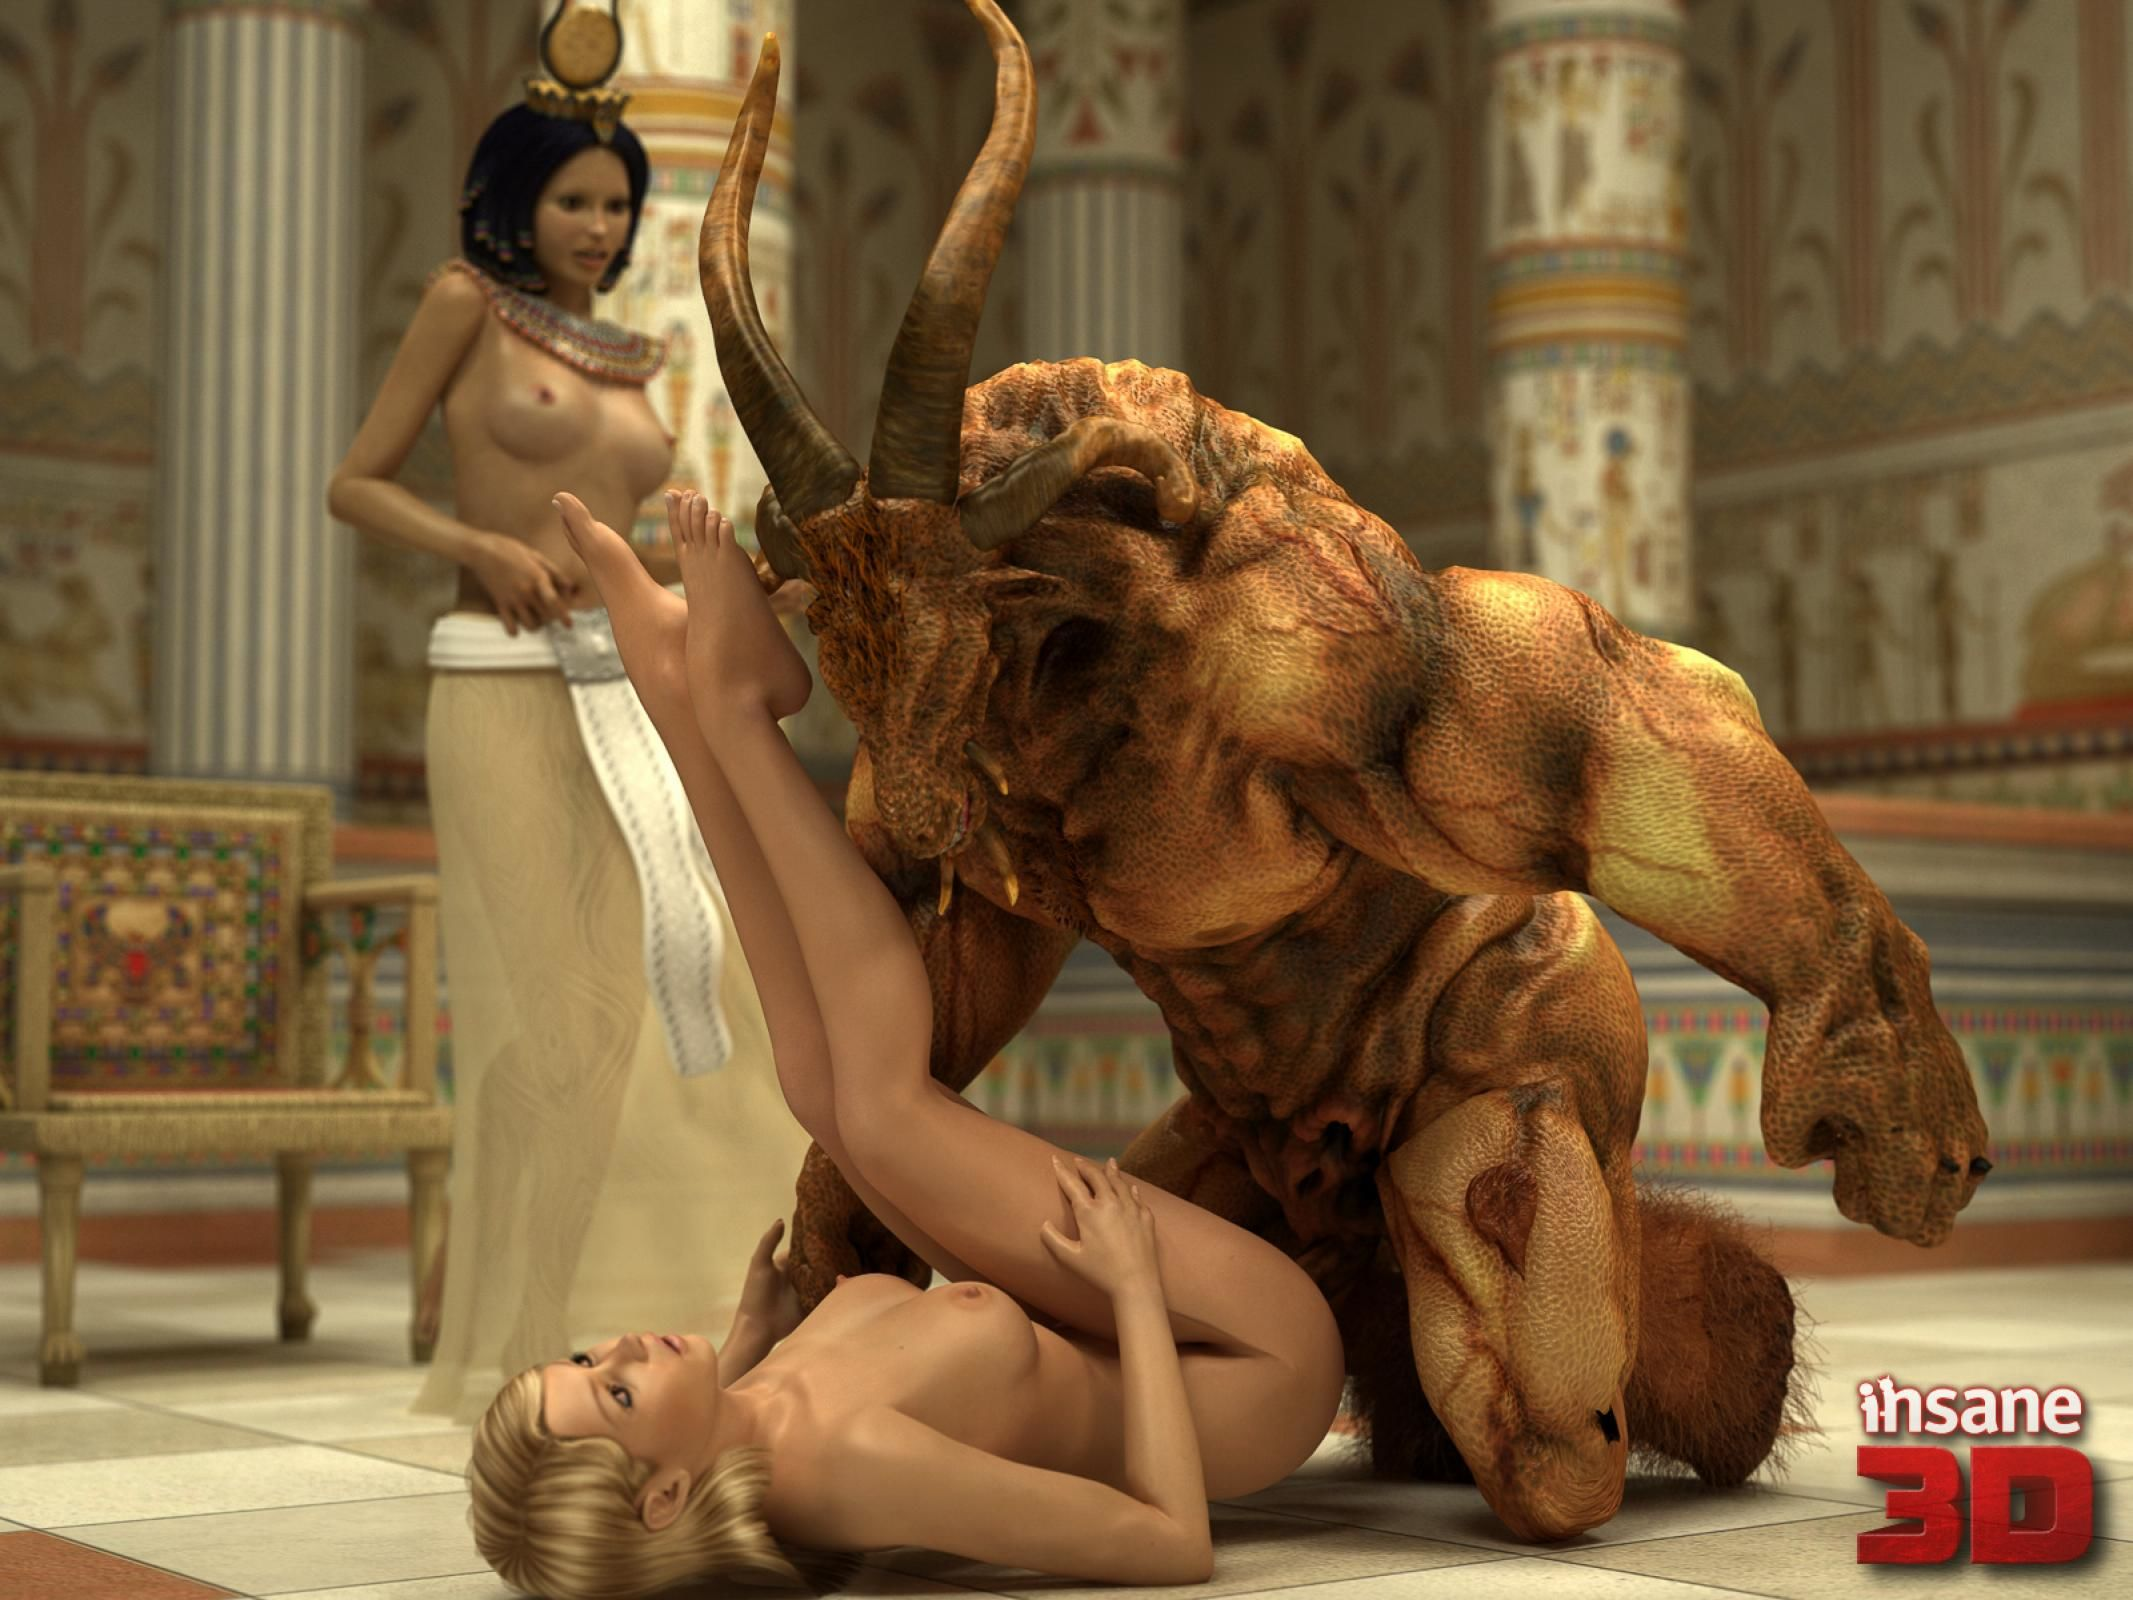 telo-bogini-seks-video